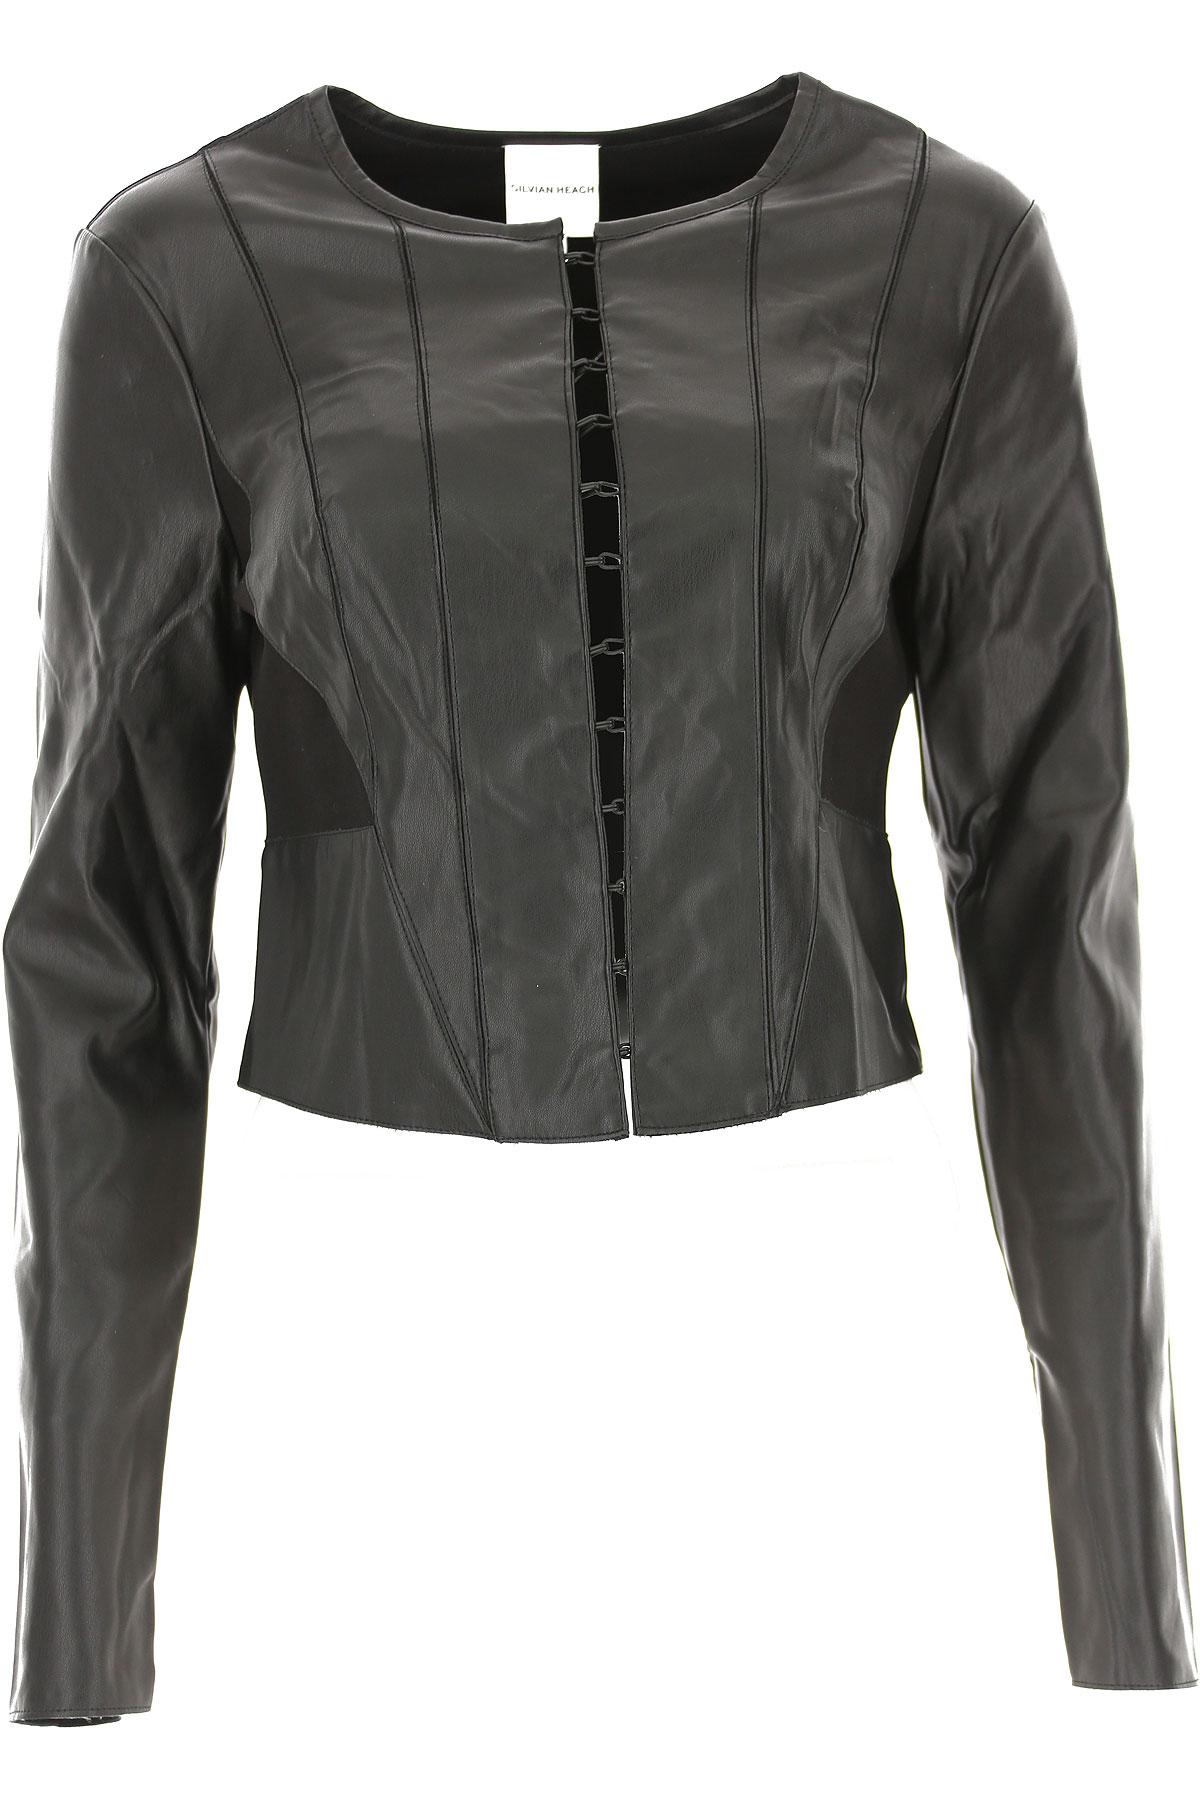 Image of Silvian Heach Jacket for Women, Black, polyurethane, 2017, 10 4 6 8